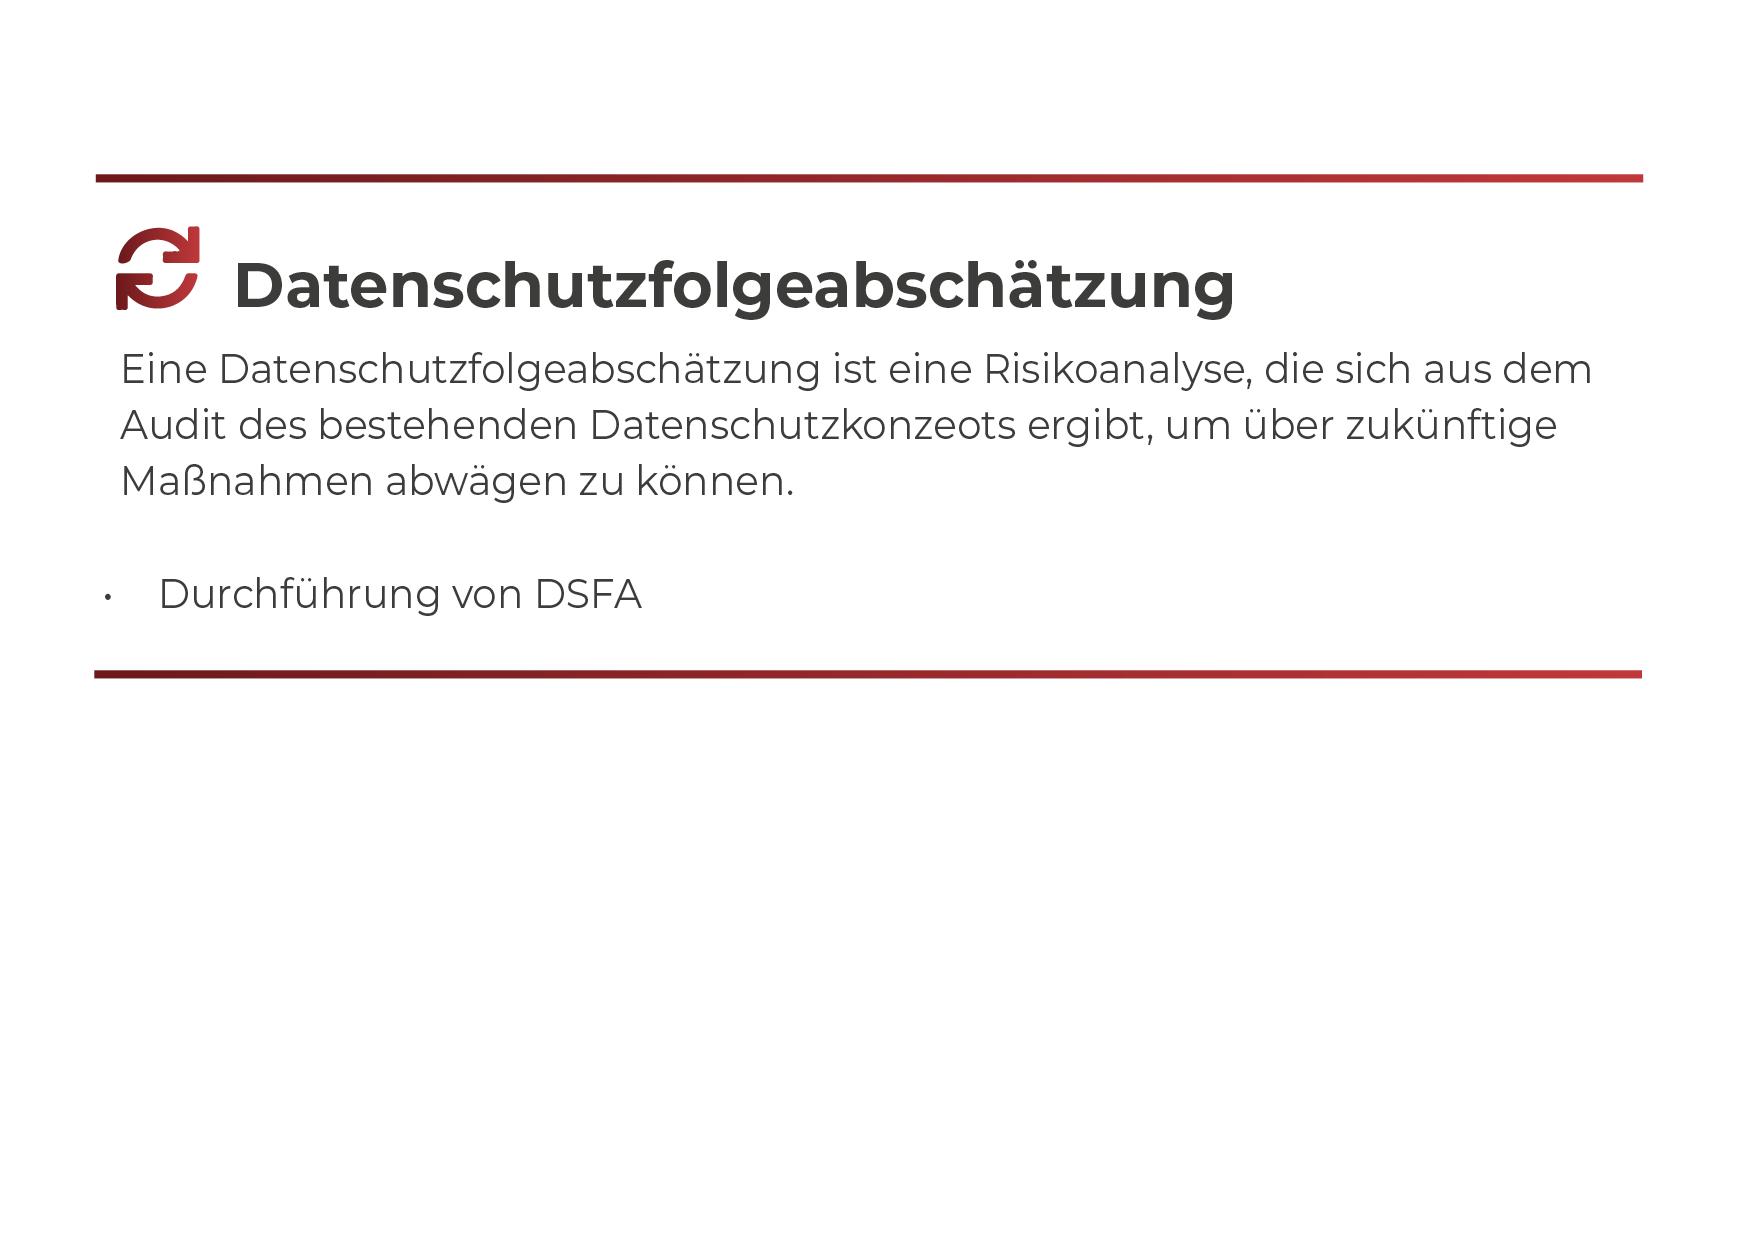 OD_DSFA